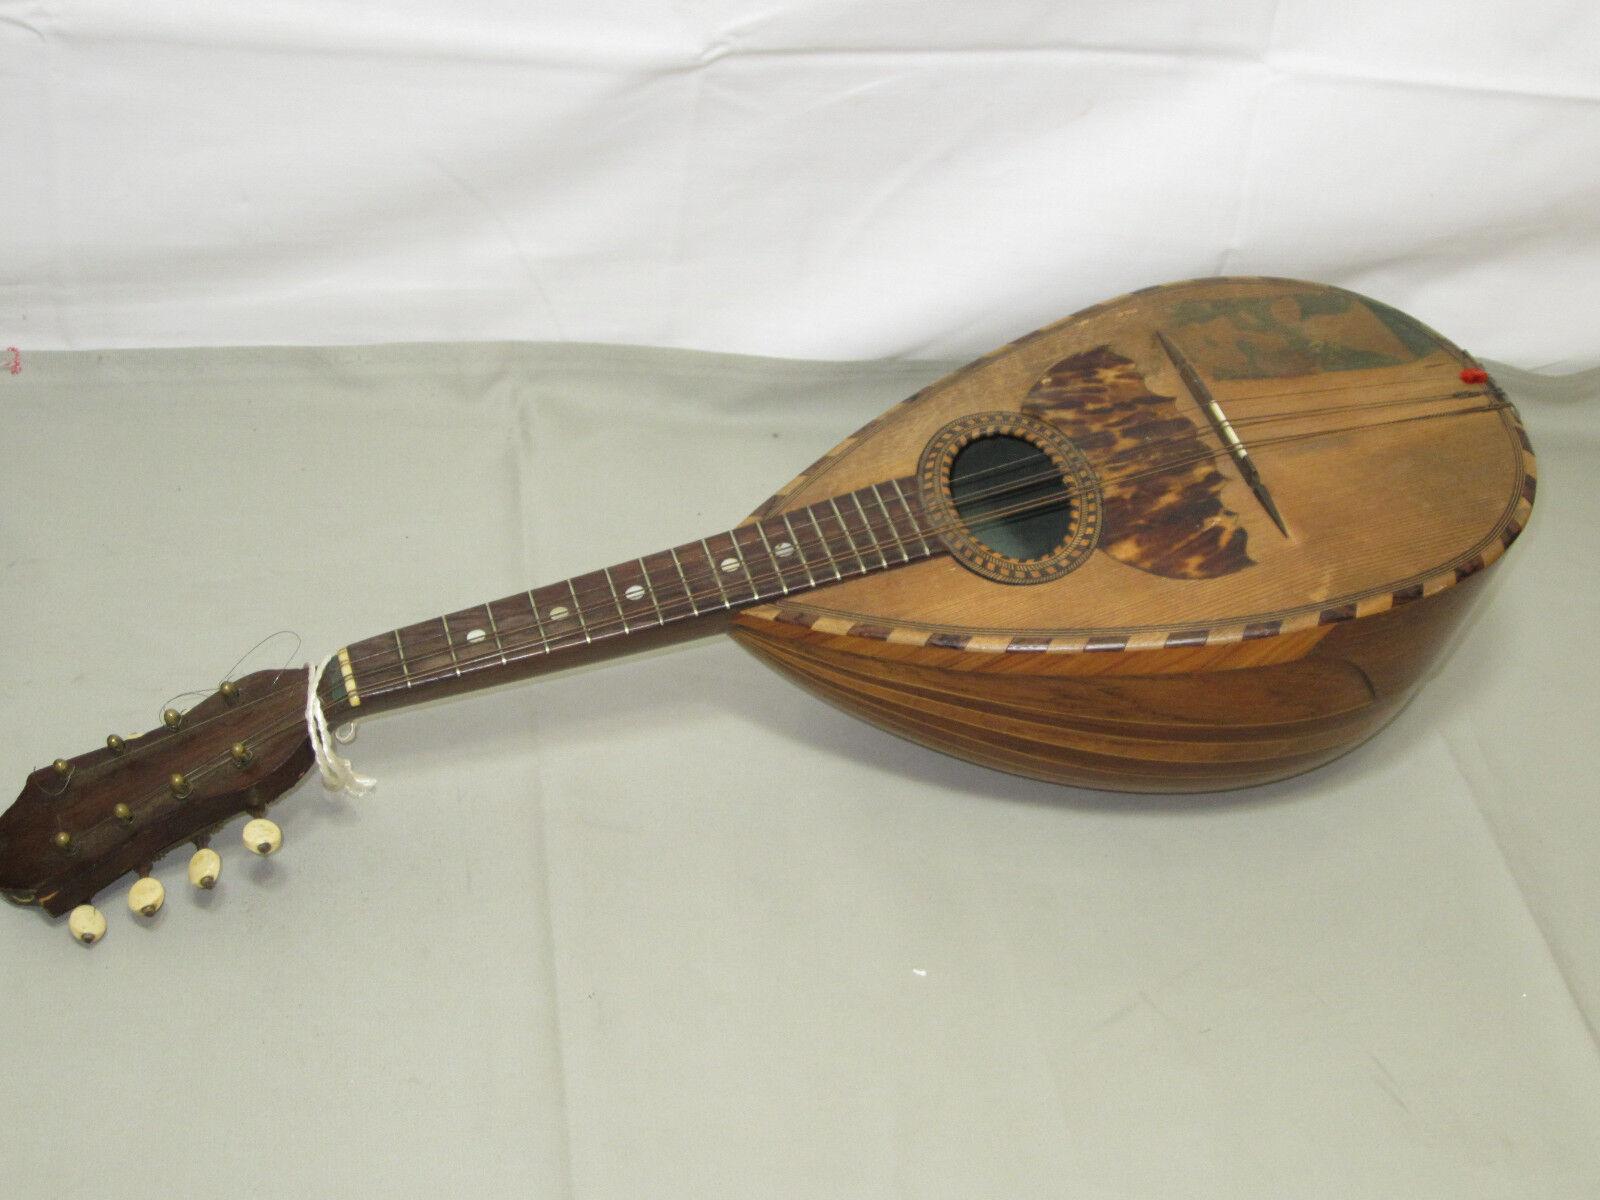 1x alte Mandoline G. Puglisi Reale Figli 8-saitig L.60cm gebraucht/Si268.2